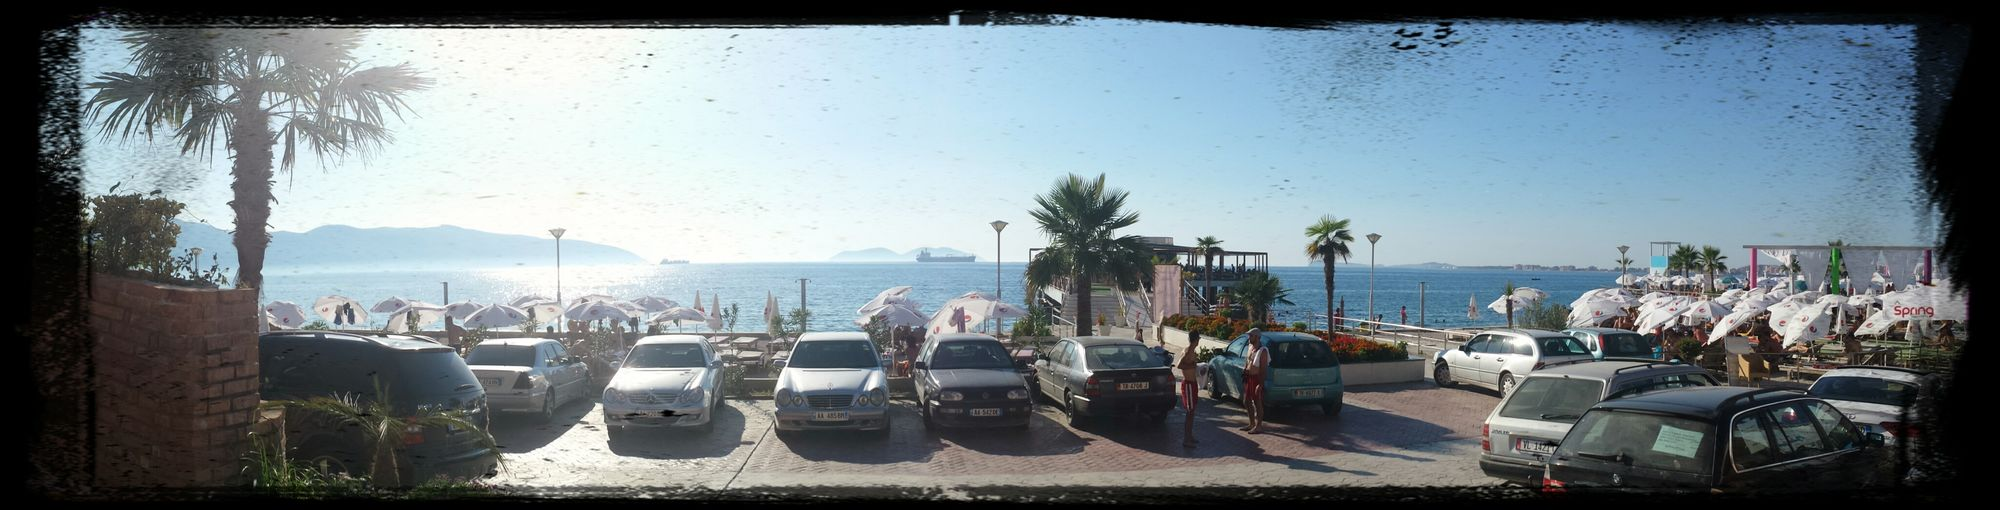 Summer Depo Relaxing Enjoying Life Albania